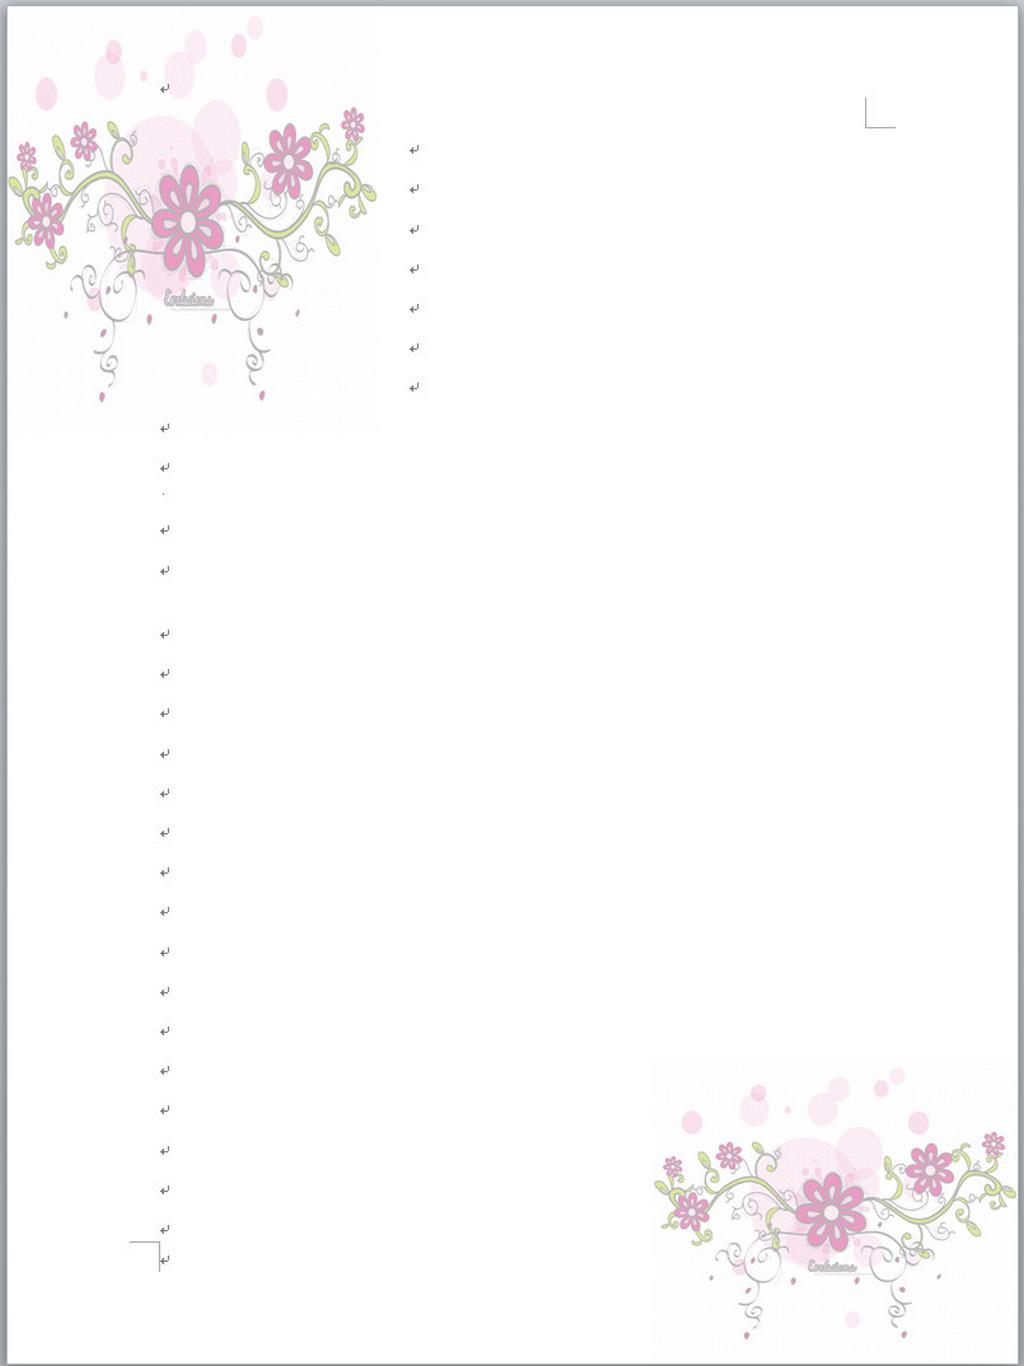 a纸信纸模板 vi信纸模板 情书信纸模板 公司信笺纸模板